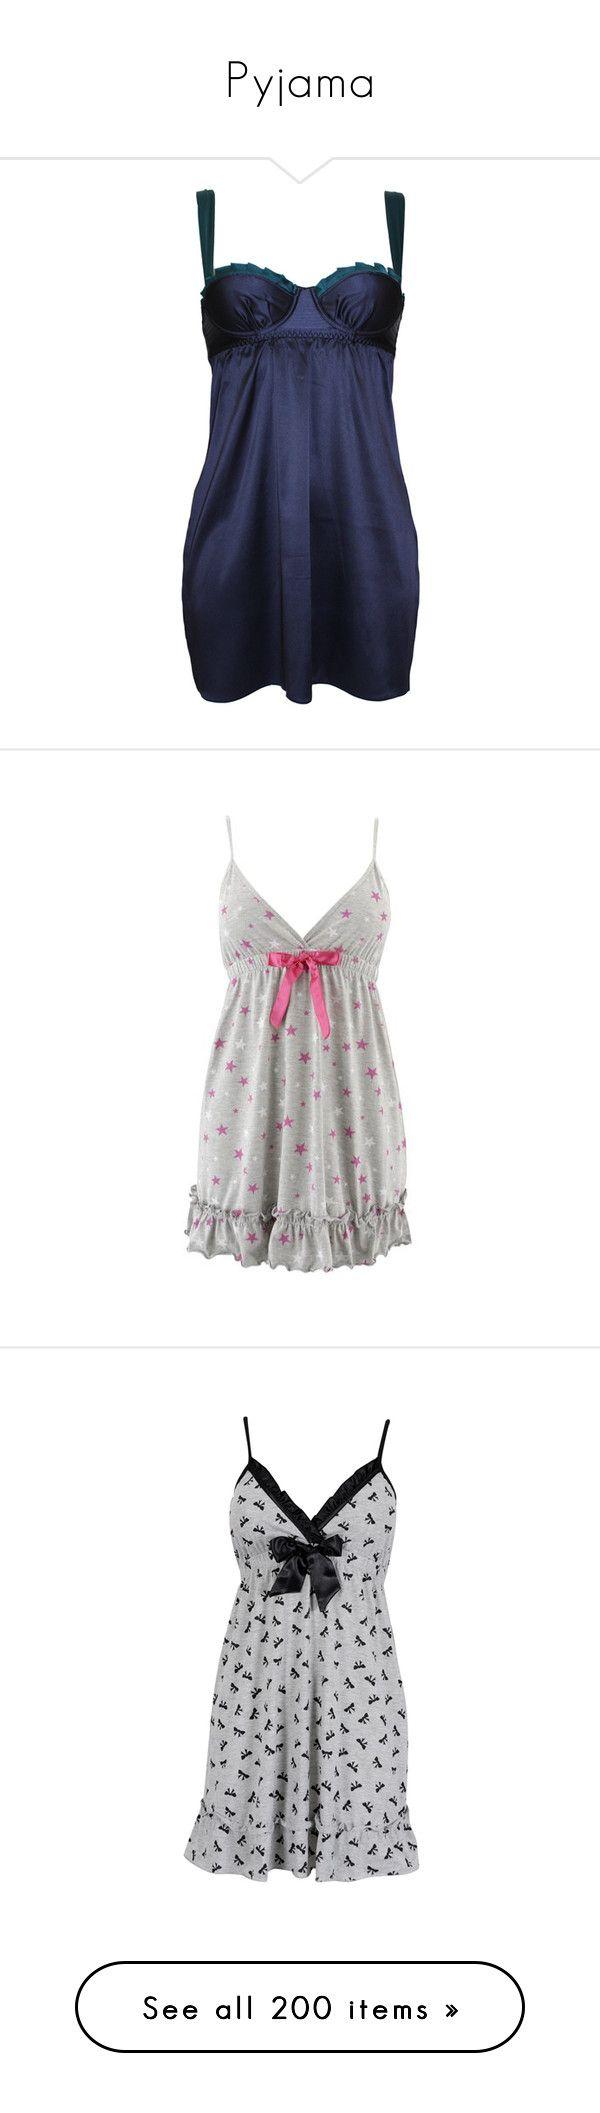 """Pyjama"" by alejaborrayo ❤ liked on Polyvore featuring intimates, sleepwear, nightgowns, dresses, lingerie, pajamas, babydoll lingerie, babydoll nightie, baby doll nightgown and lingerie sleepwear"